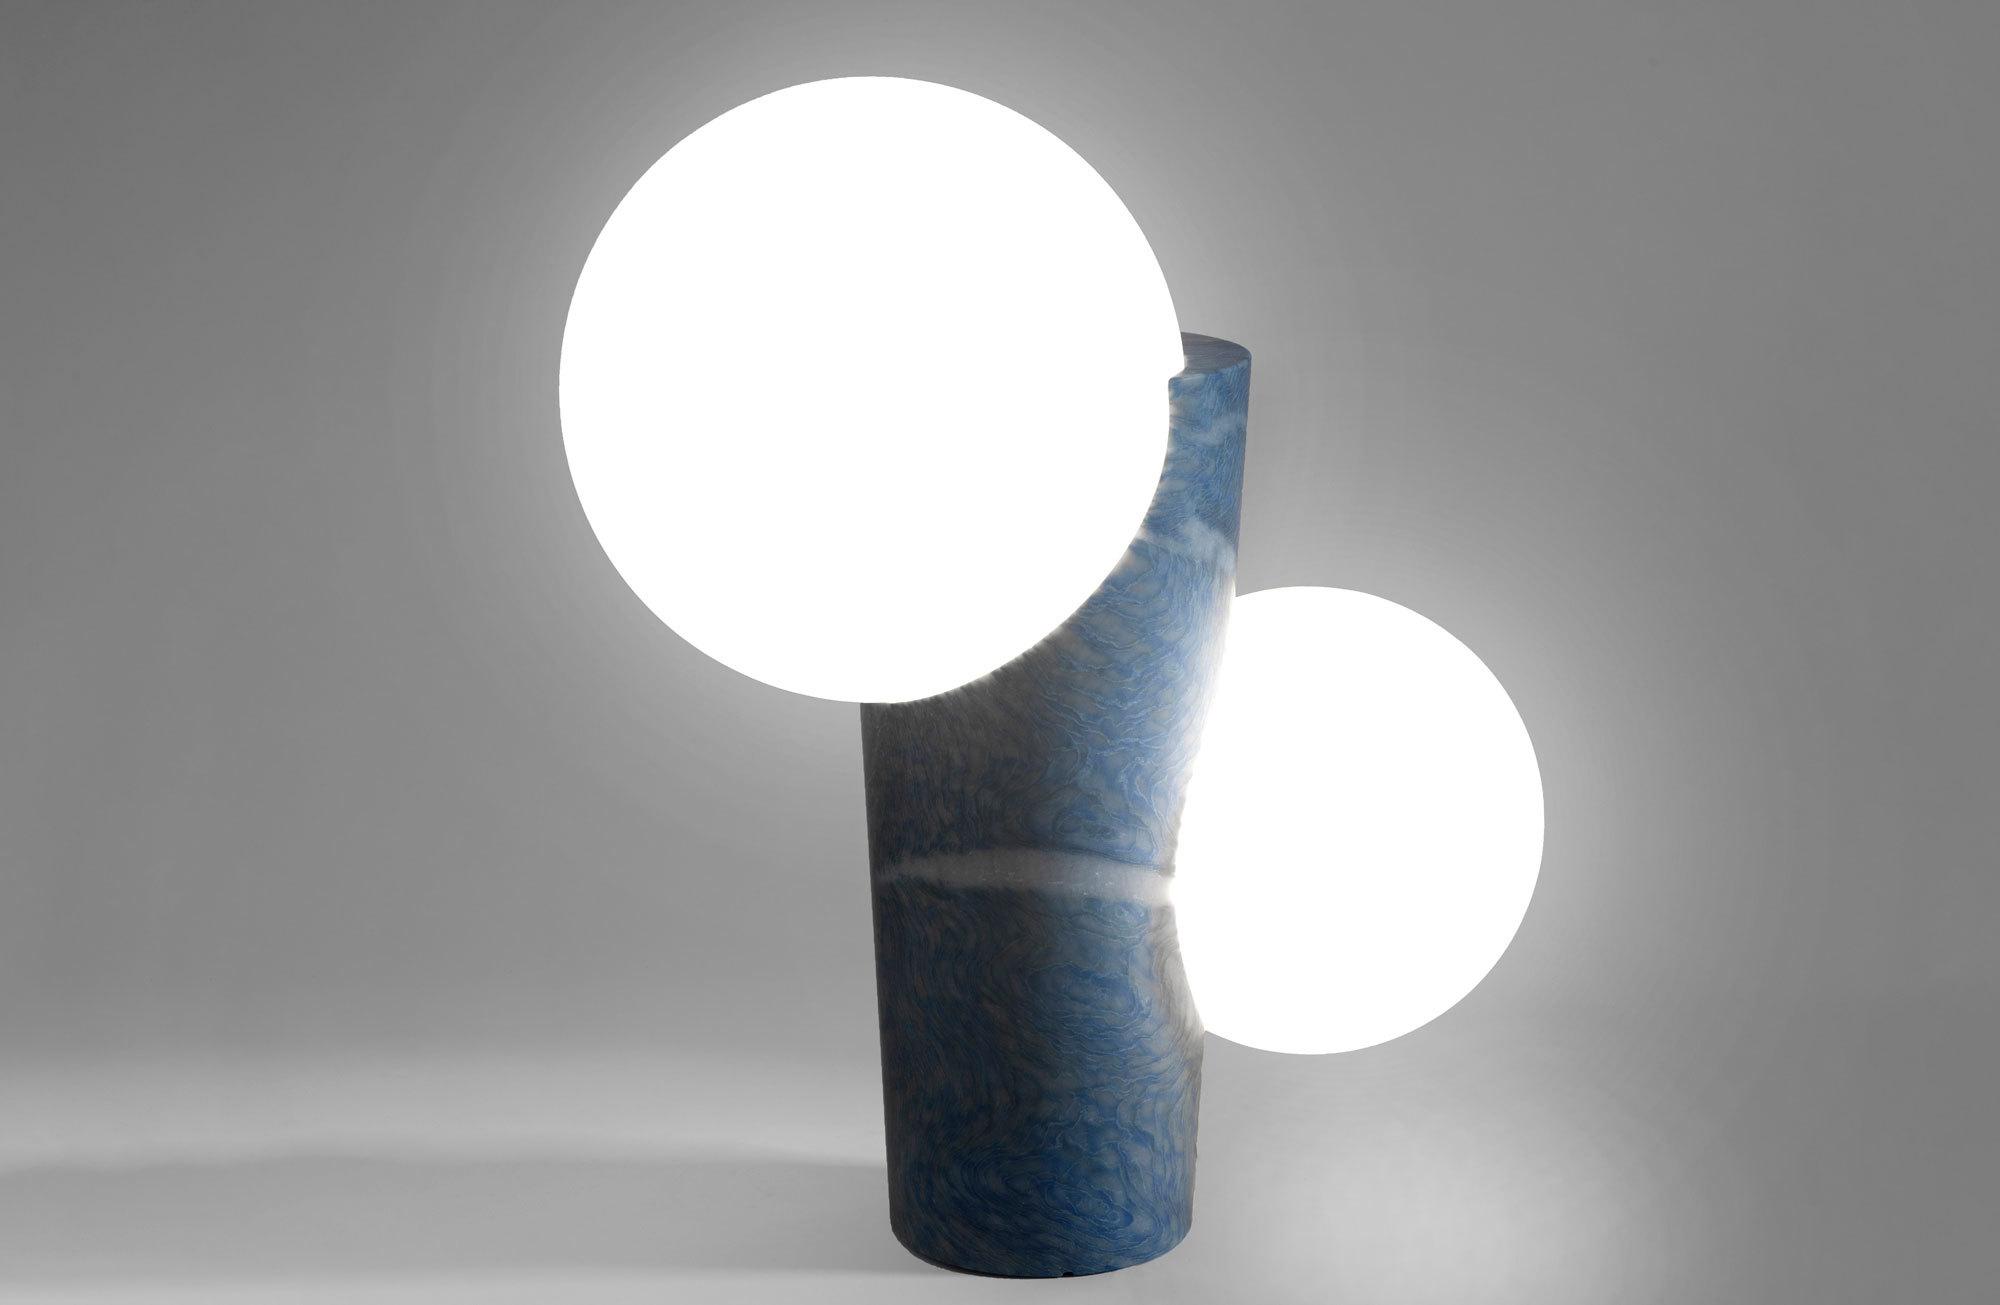 Model 1 der Leuchte Osmosi Light aus dem brasilianischen Quarzit Blue Macaubas, Foto: Valentina Zanobelli